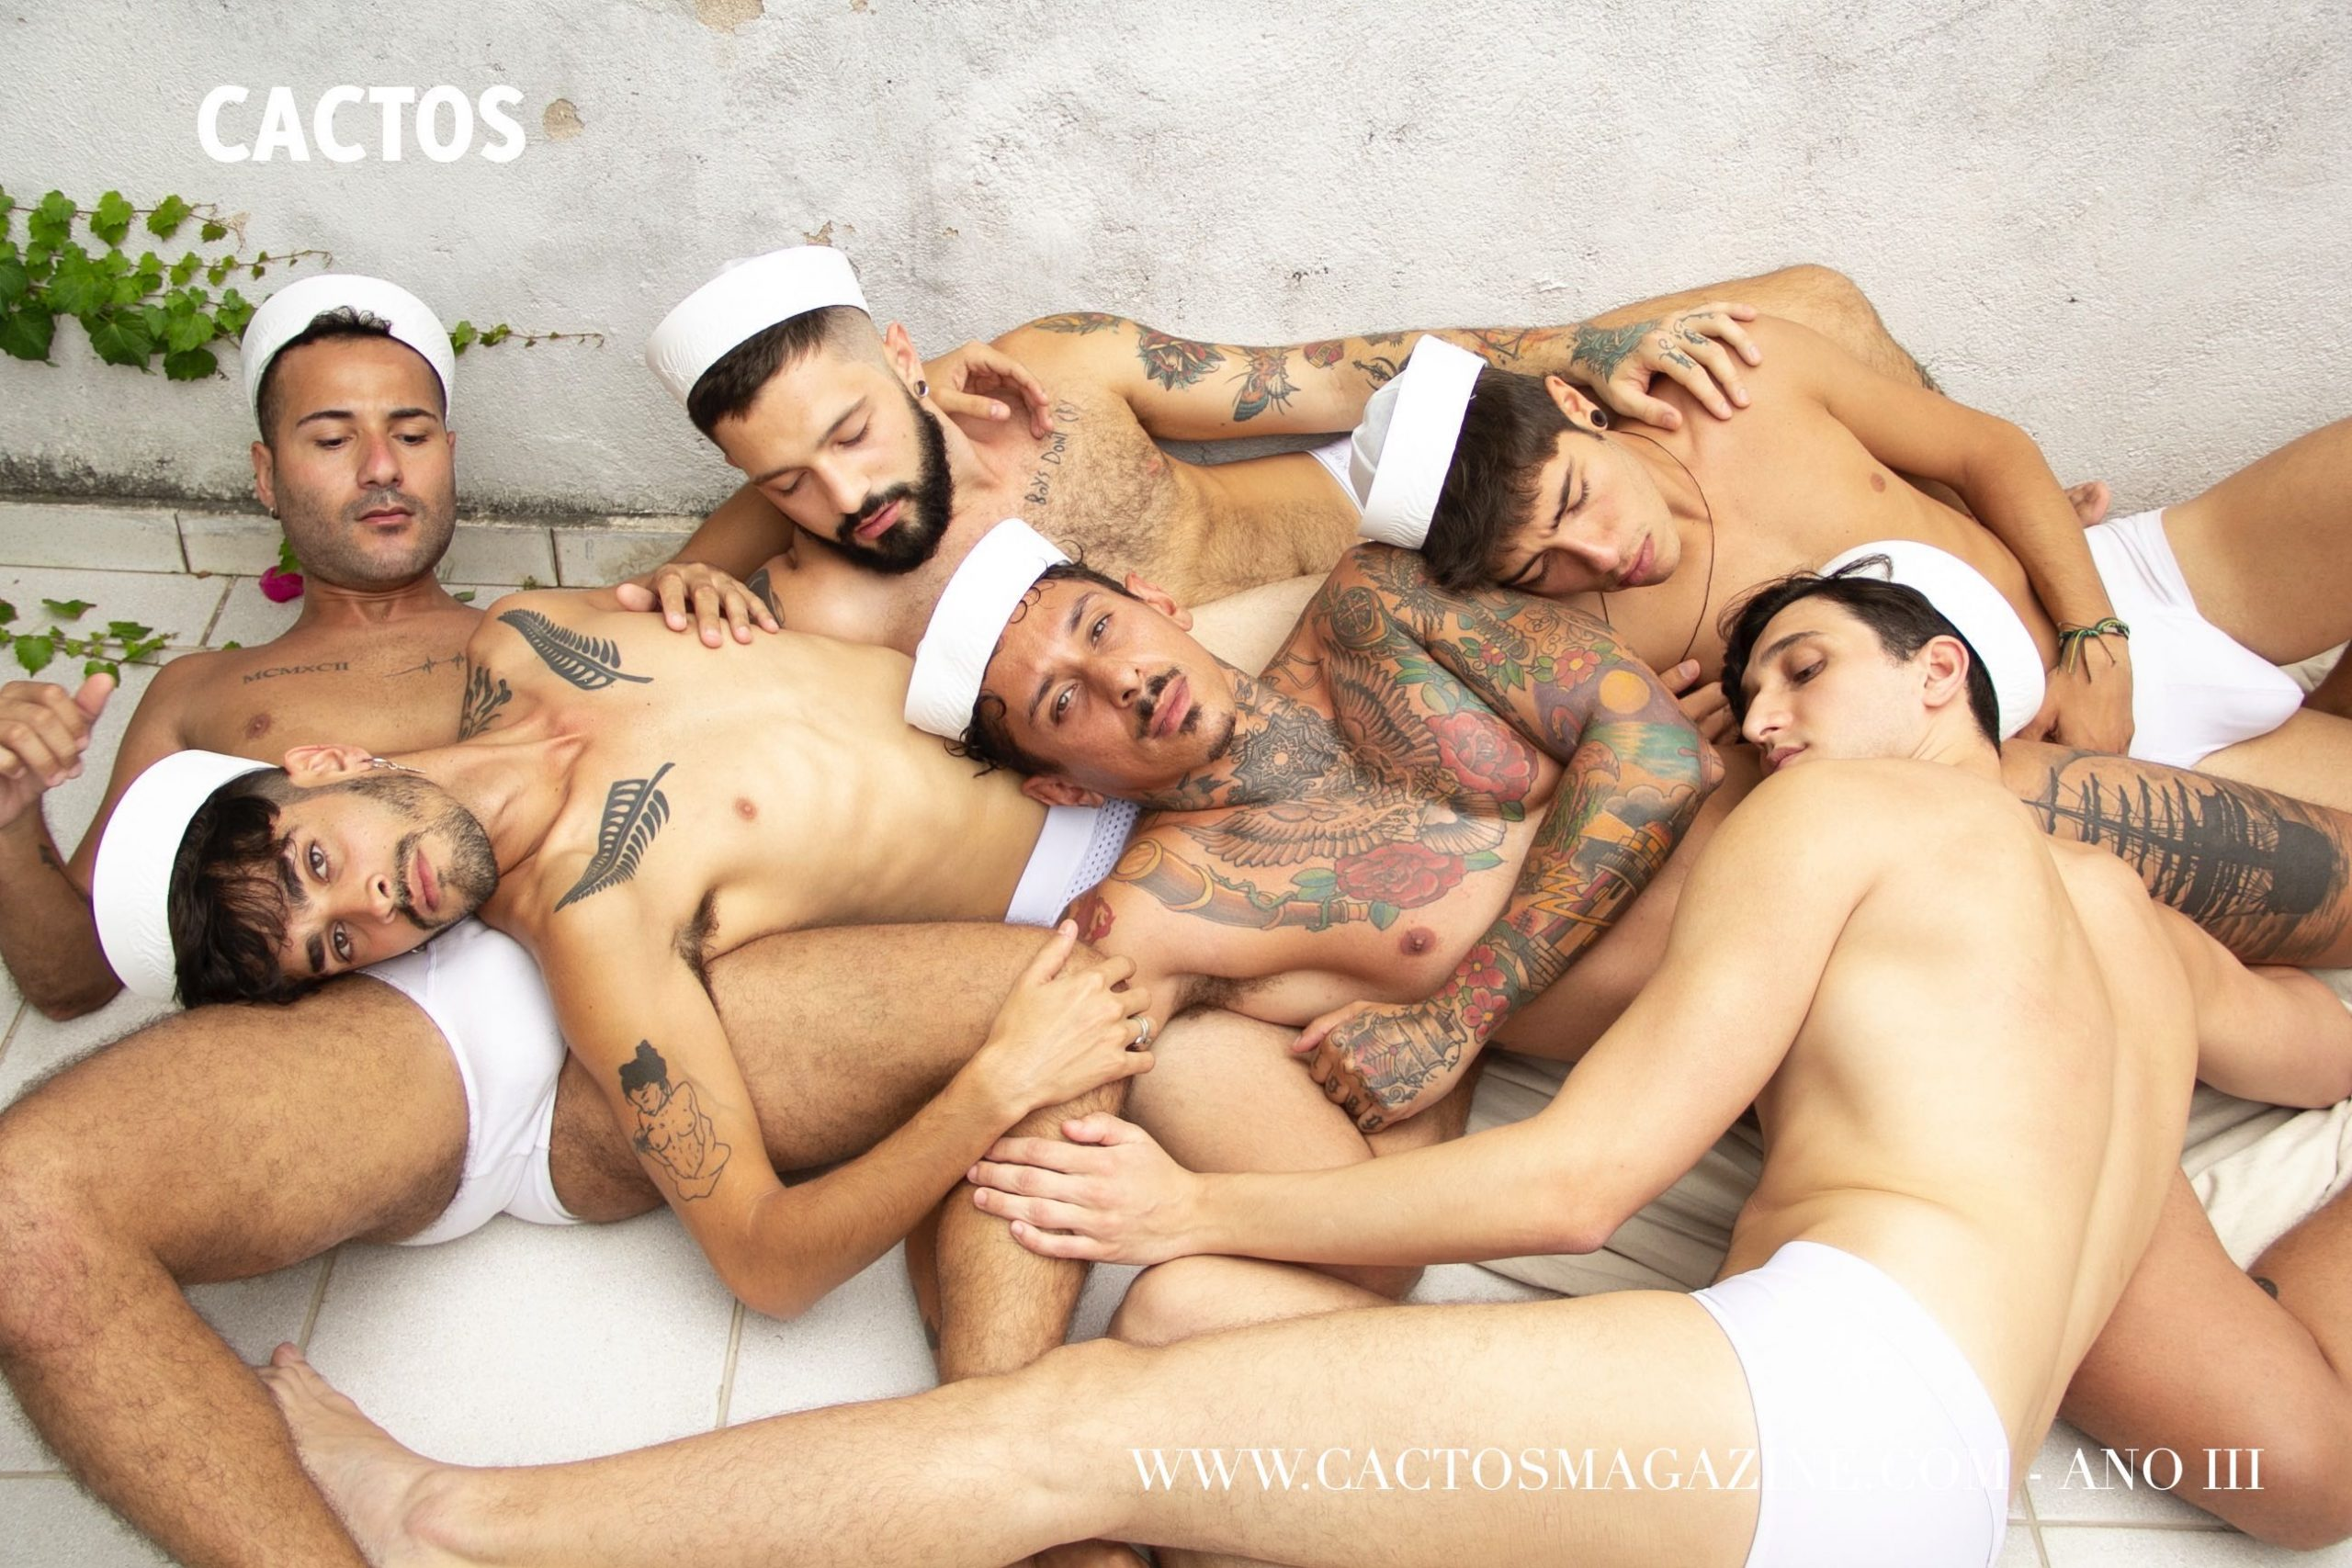 Cactos Magazine #54 by Luiz Meloc